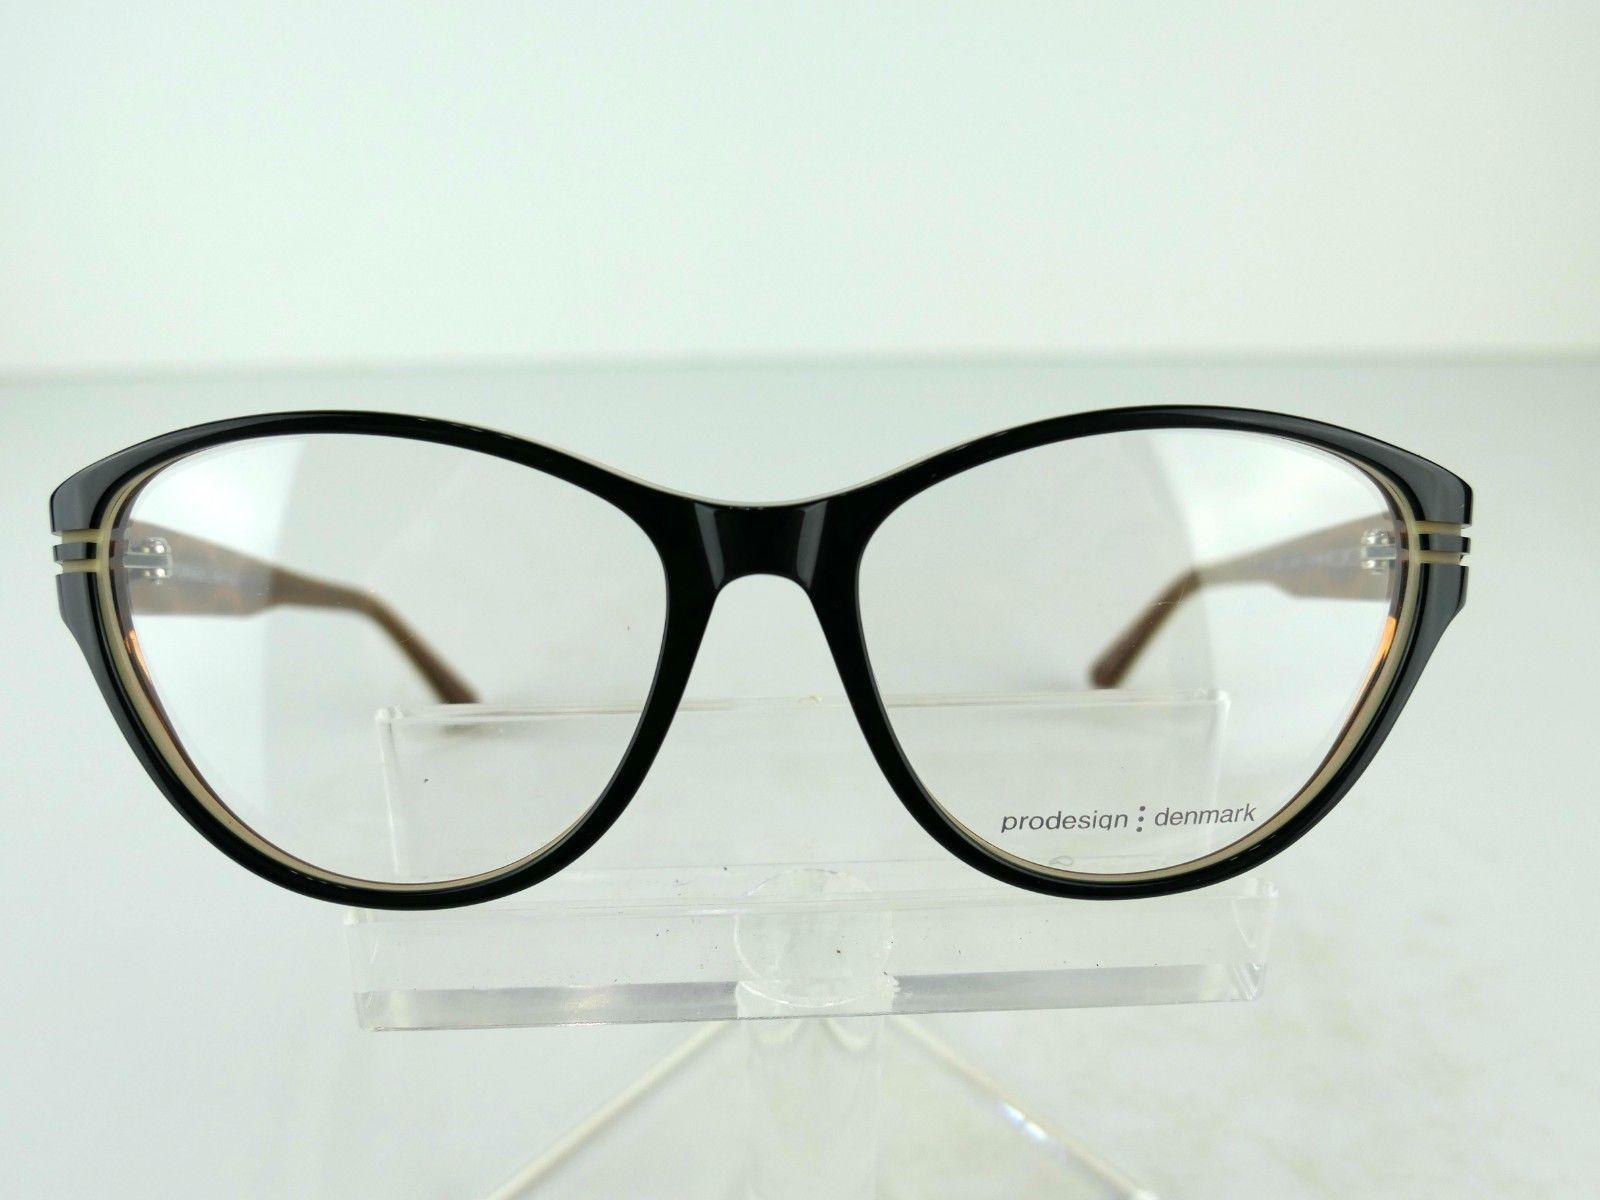 PRODESIGN DENMARK 1696 (6022) Black Shiny 55  x 16  Eyeglass Frames image 3